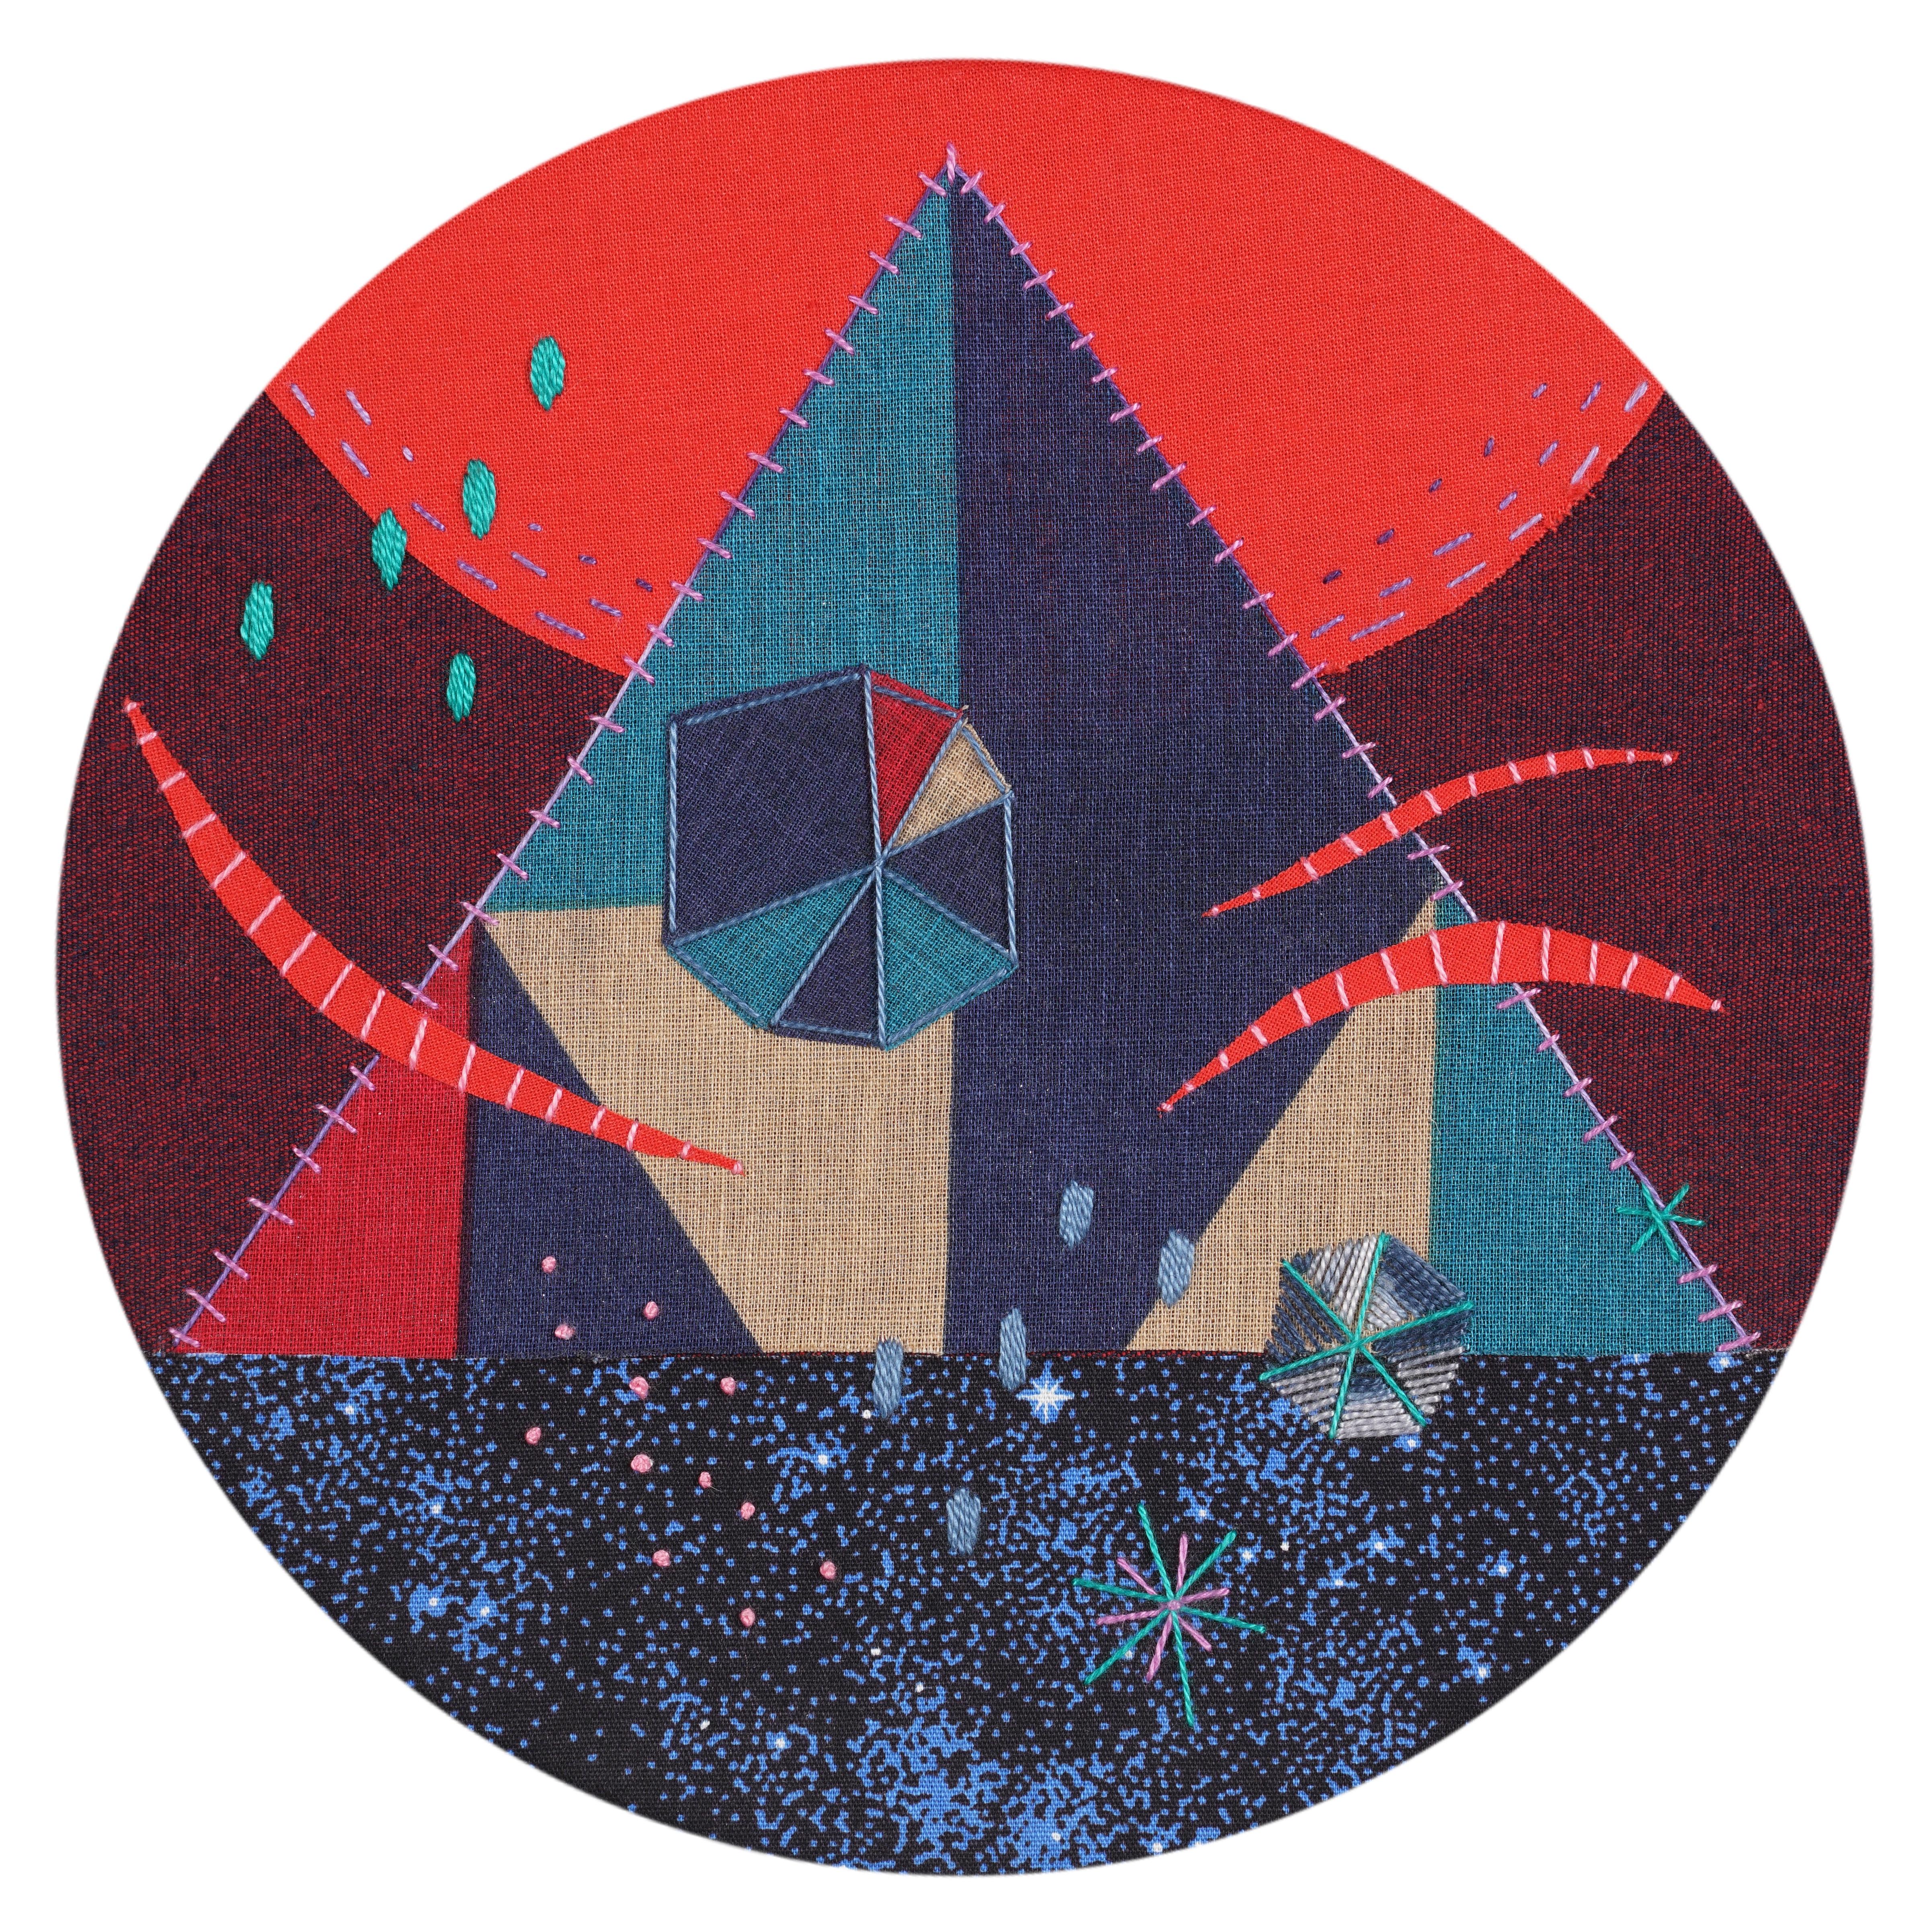 Space Pyramid